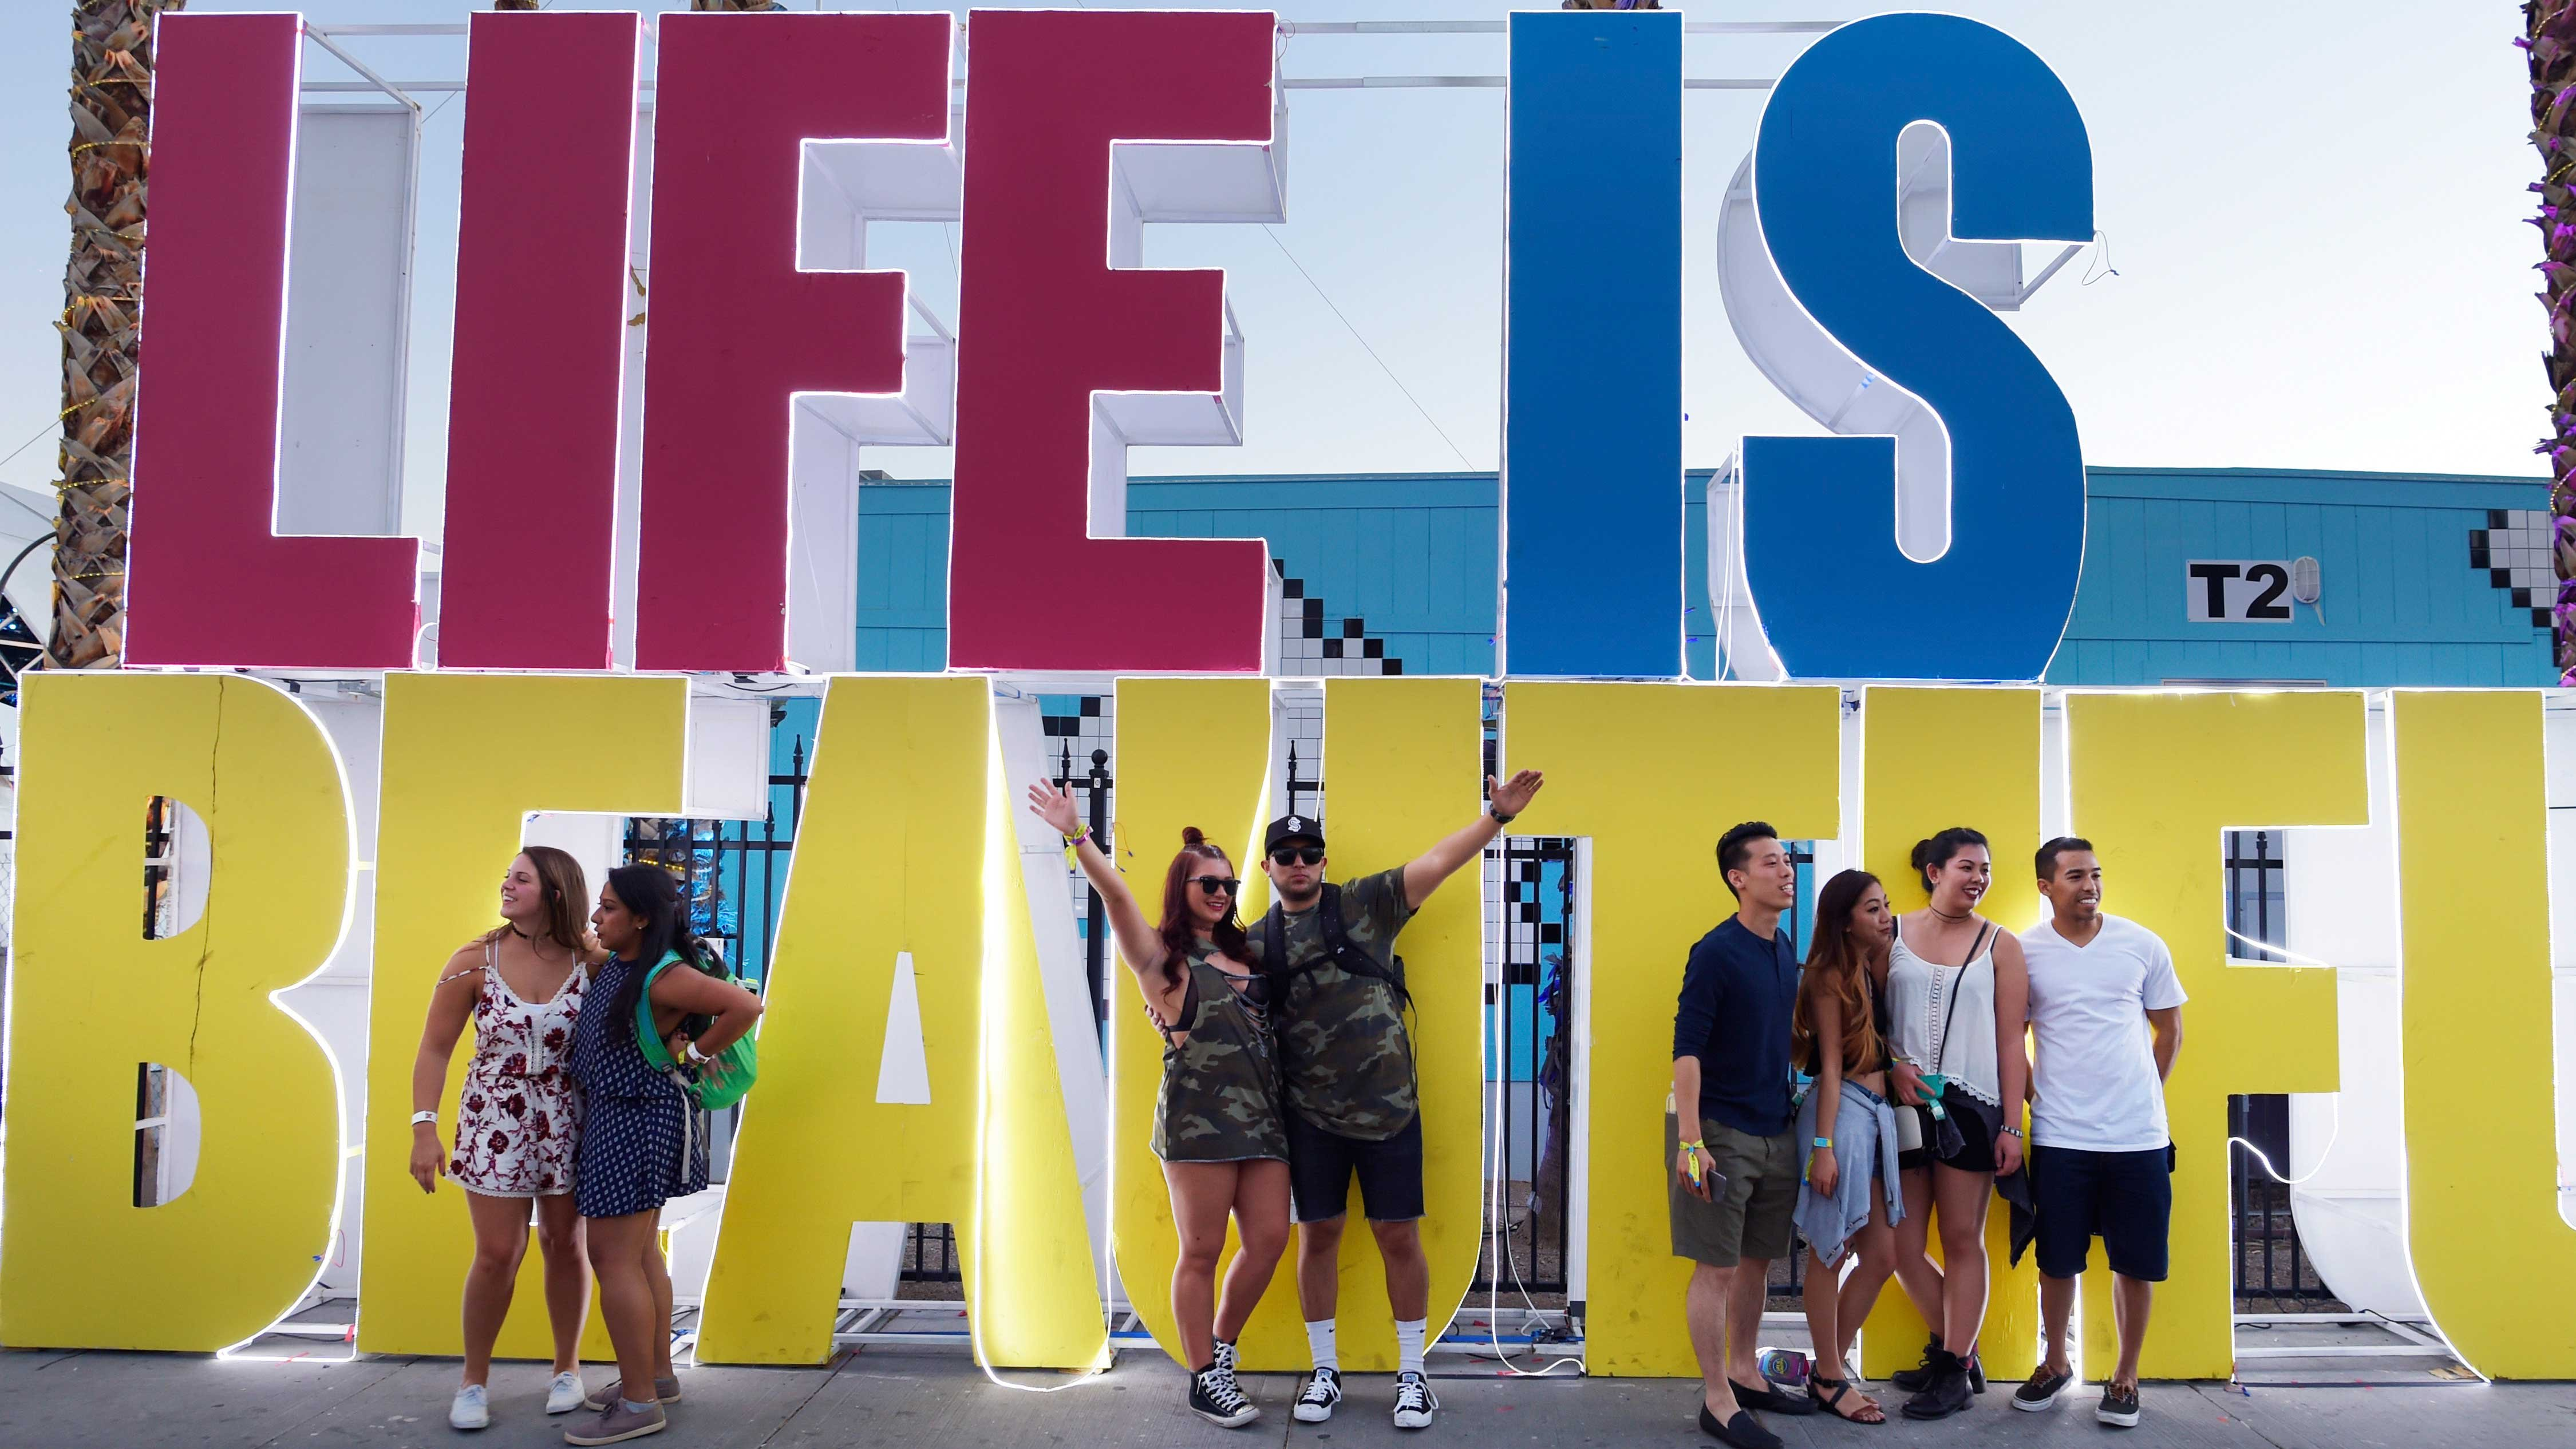 Sam Morris/Las Vegas Convention & Visitors Authority